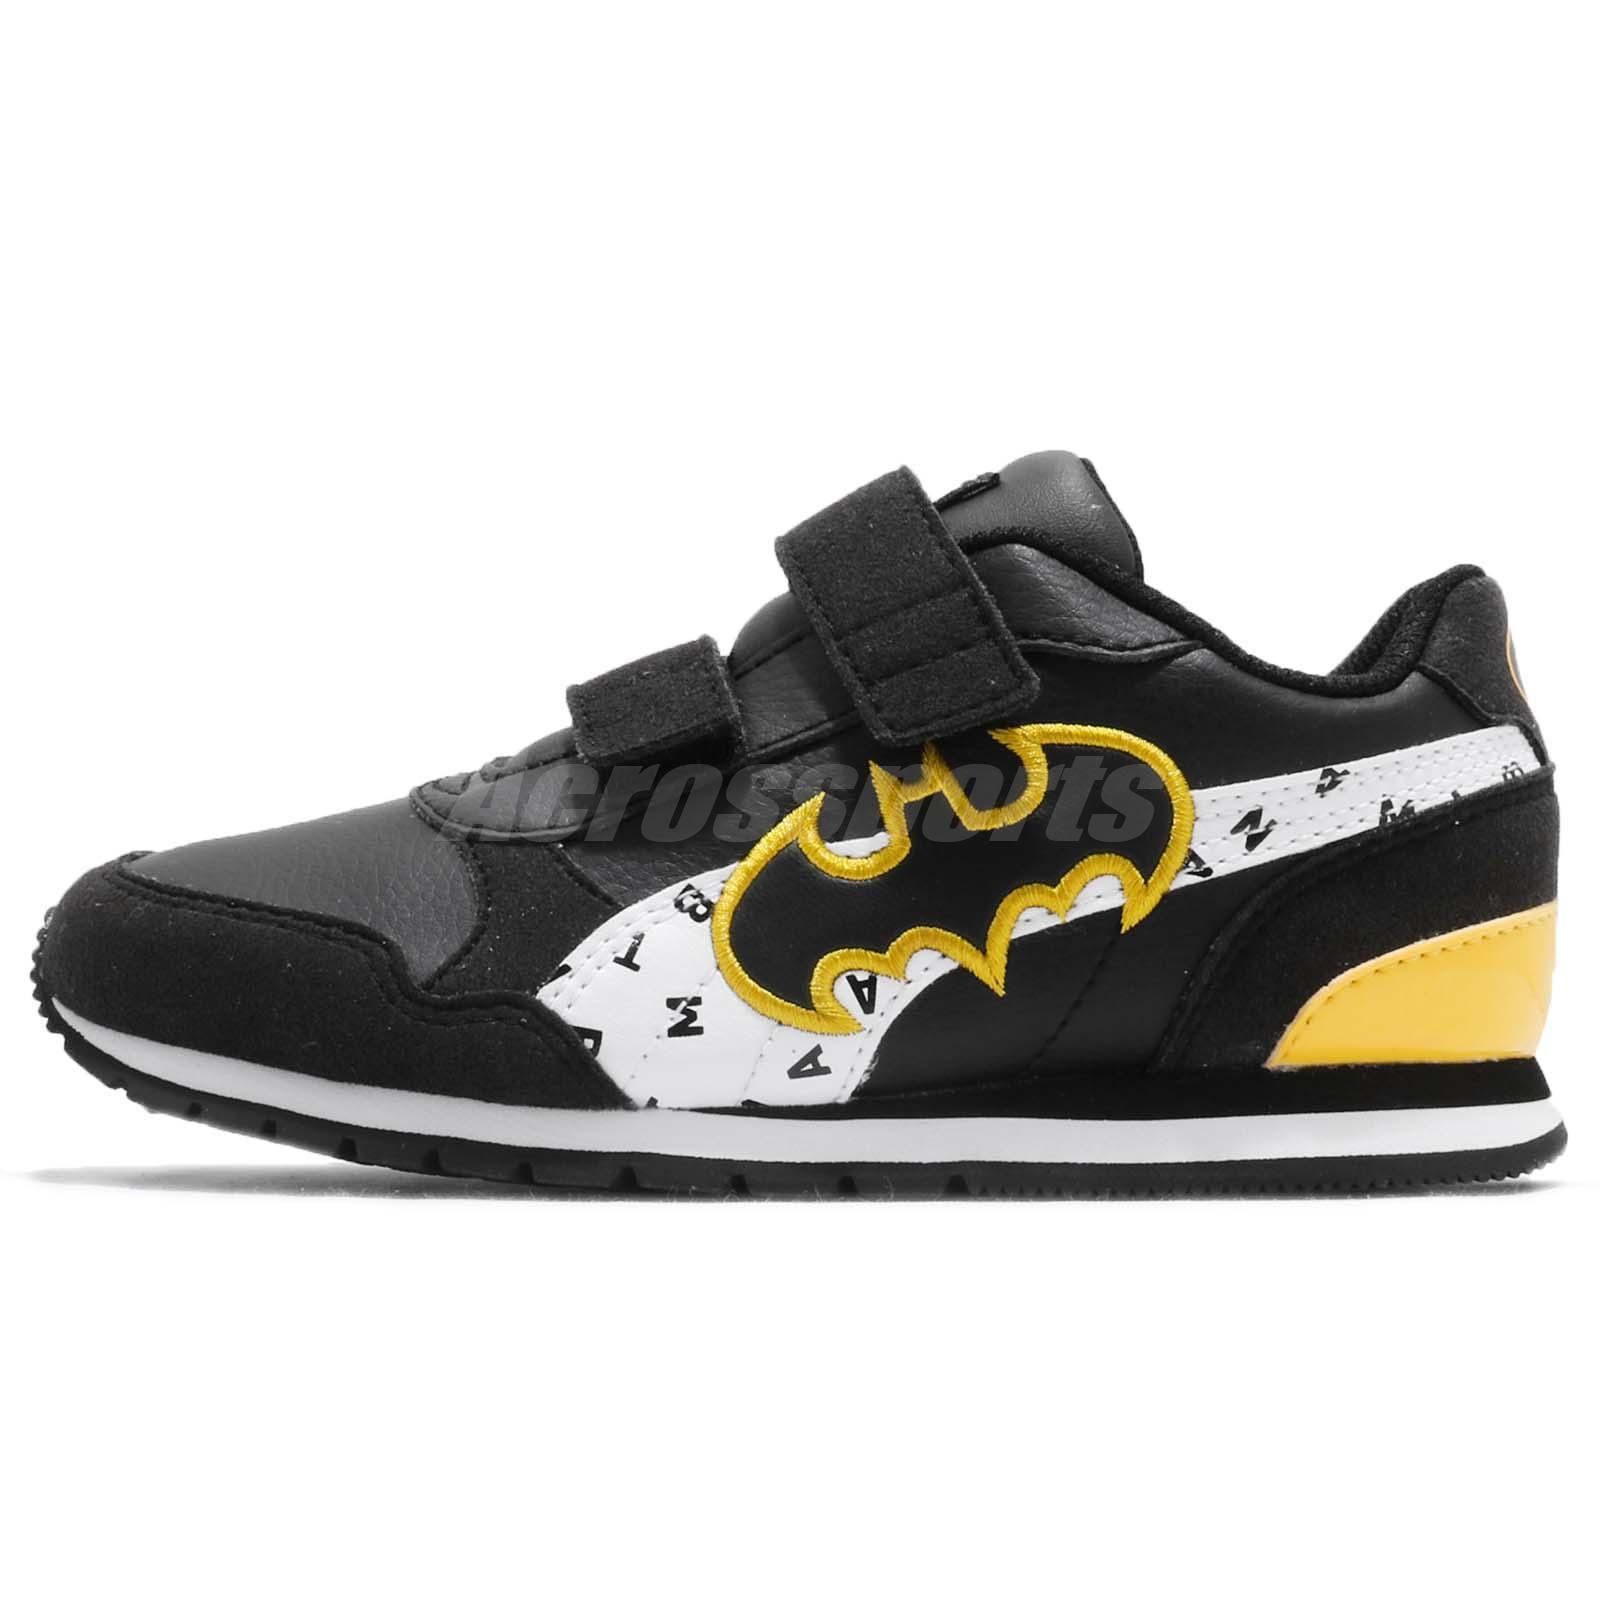 9d6791c8485854 Puma JL ST Runner V2 V PS Justice League Batman Kids Running Shoes 366741-01